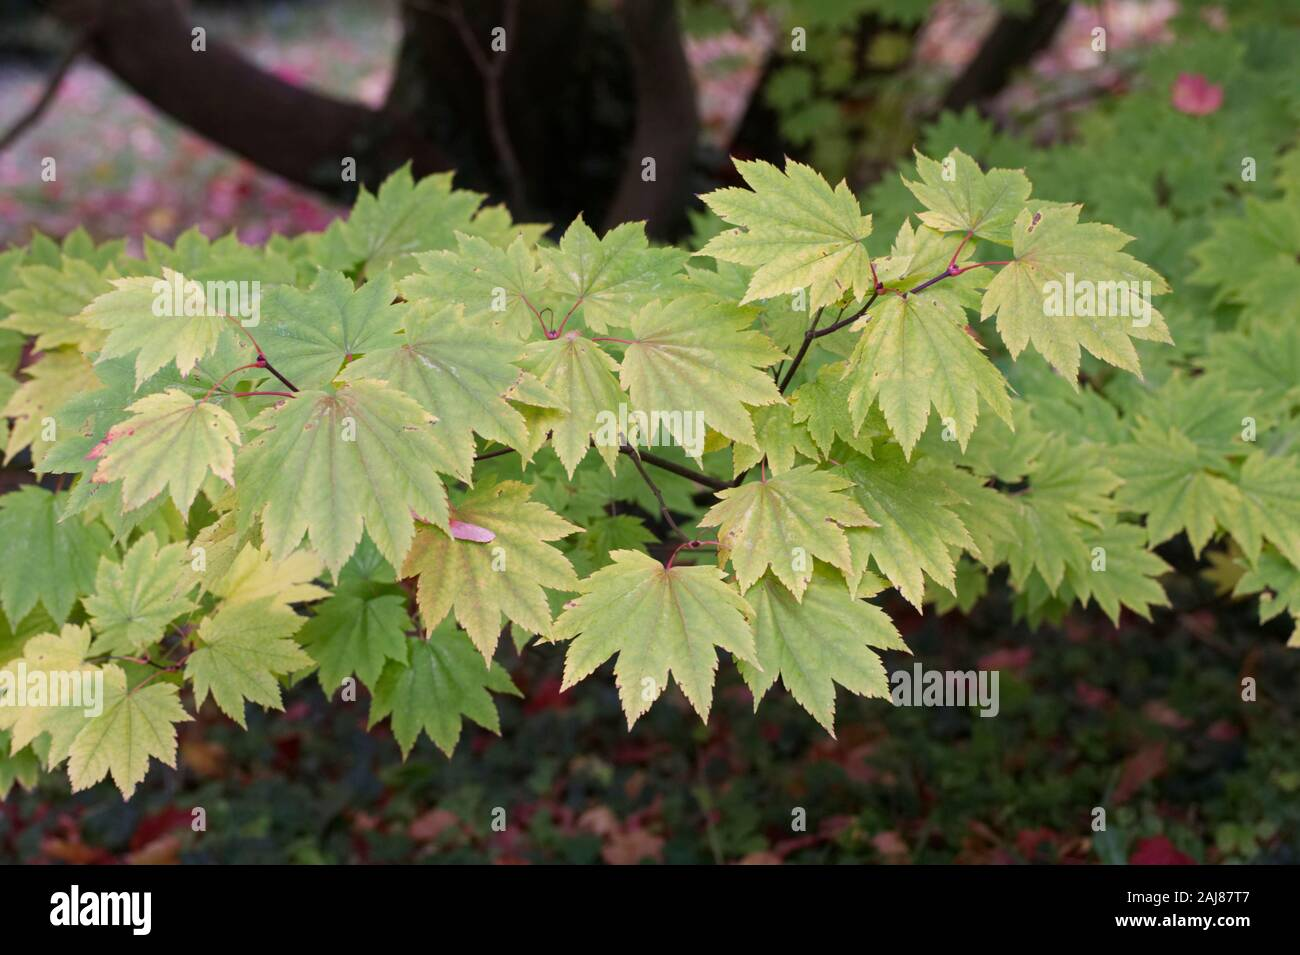 Acer japonicum 'Full Moon Magic' leaves in Autumn. Stock Photo